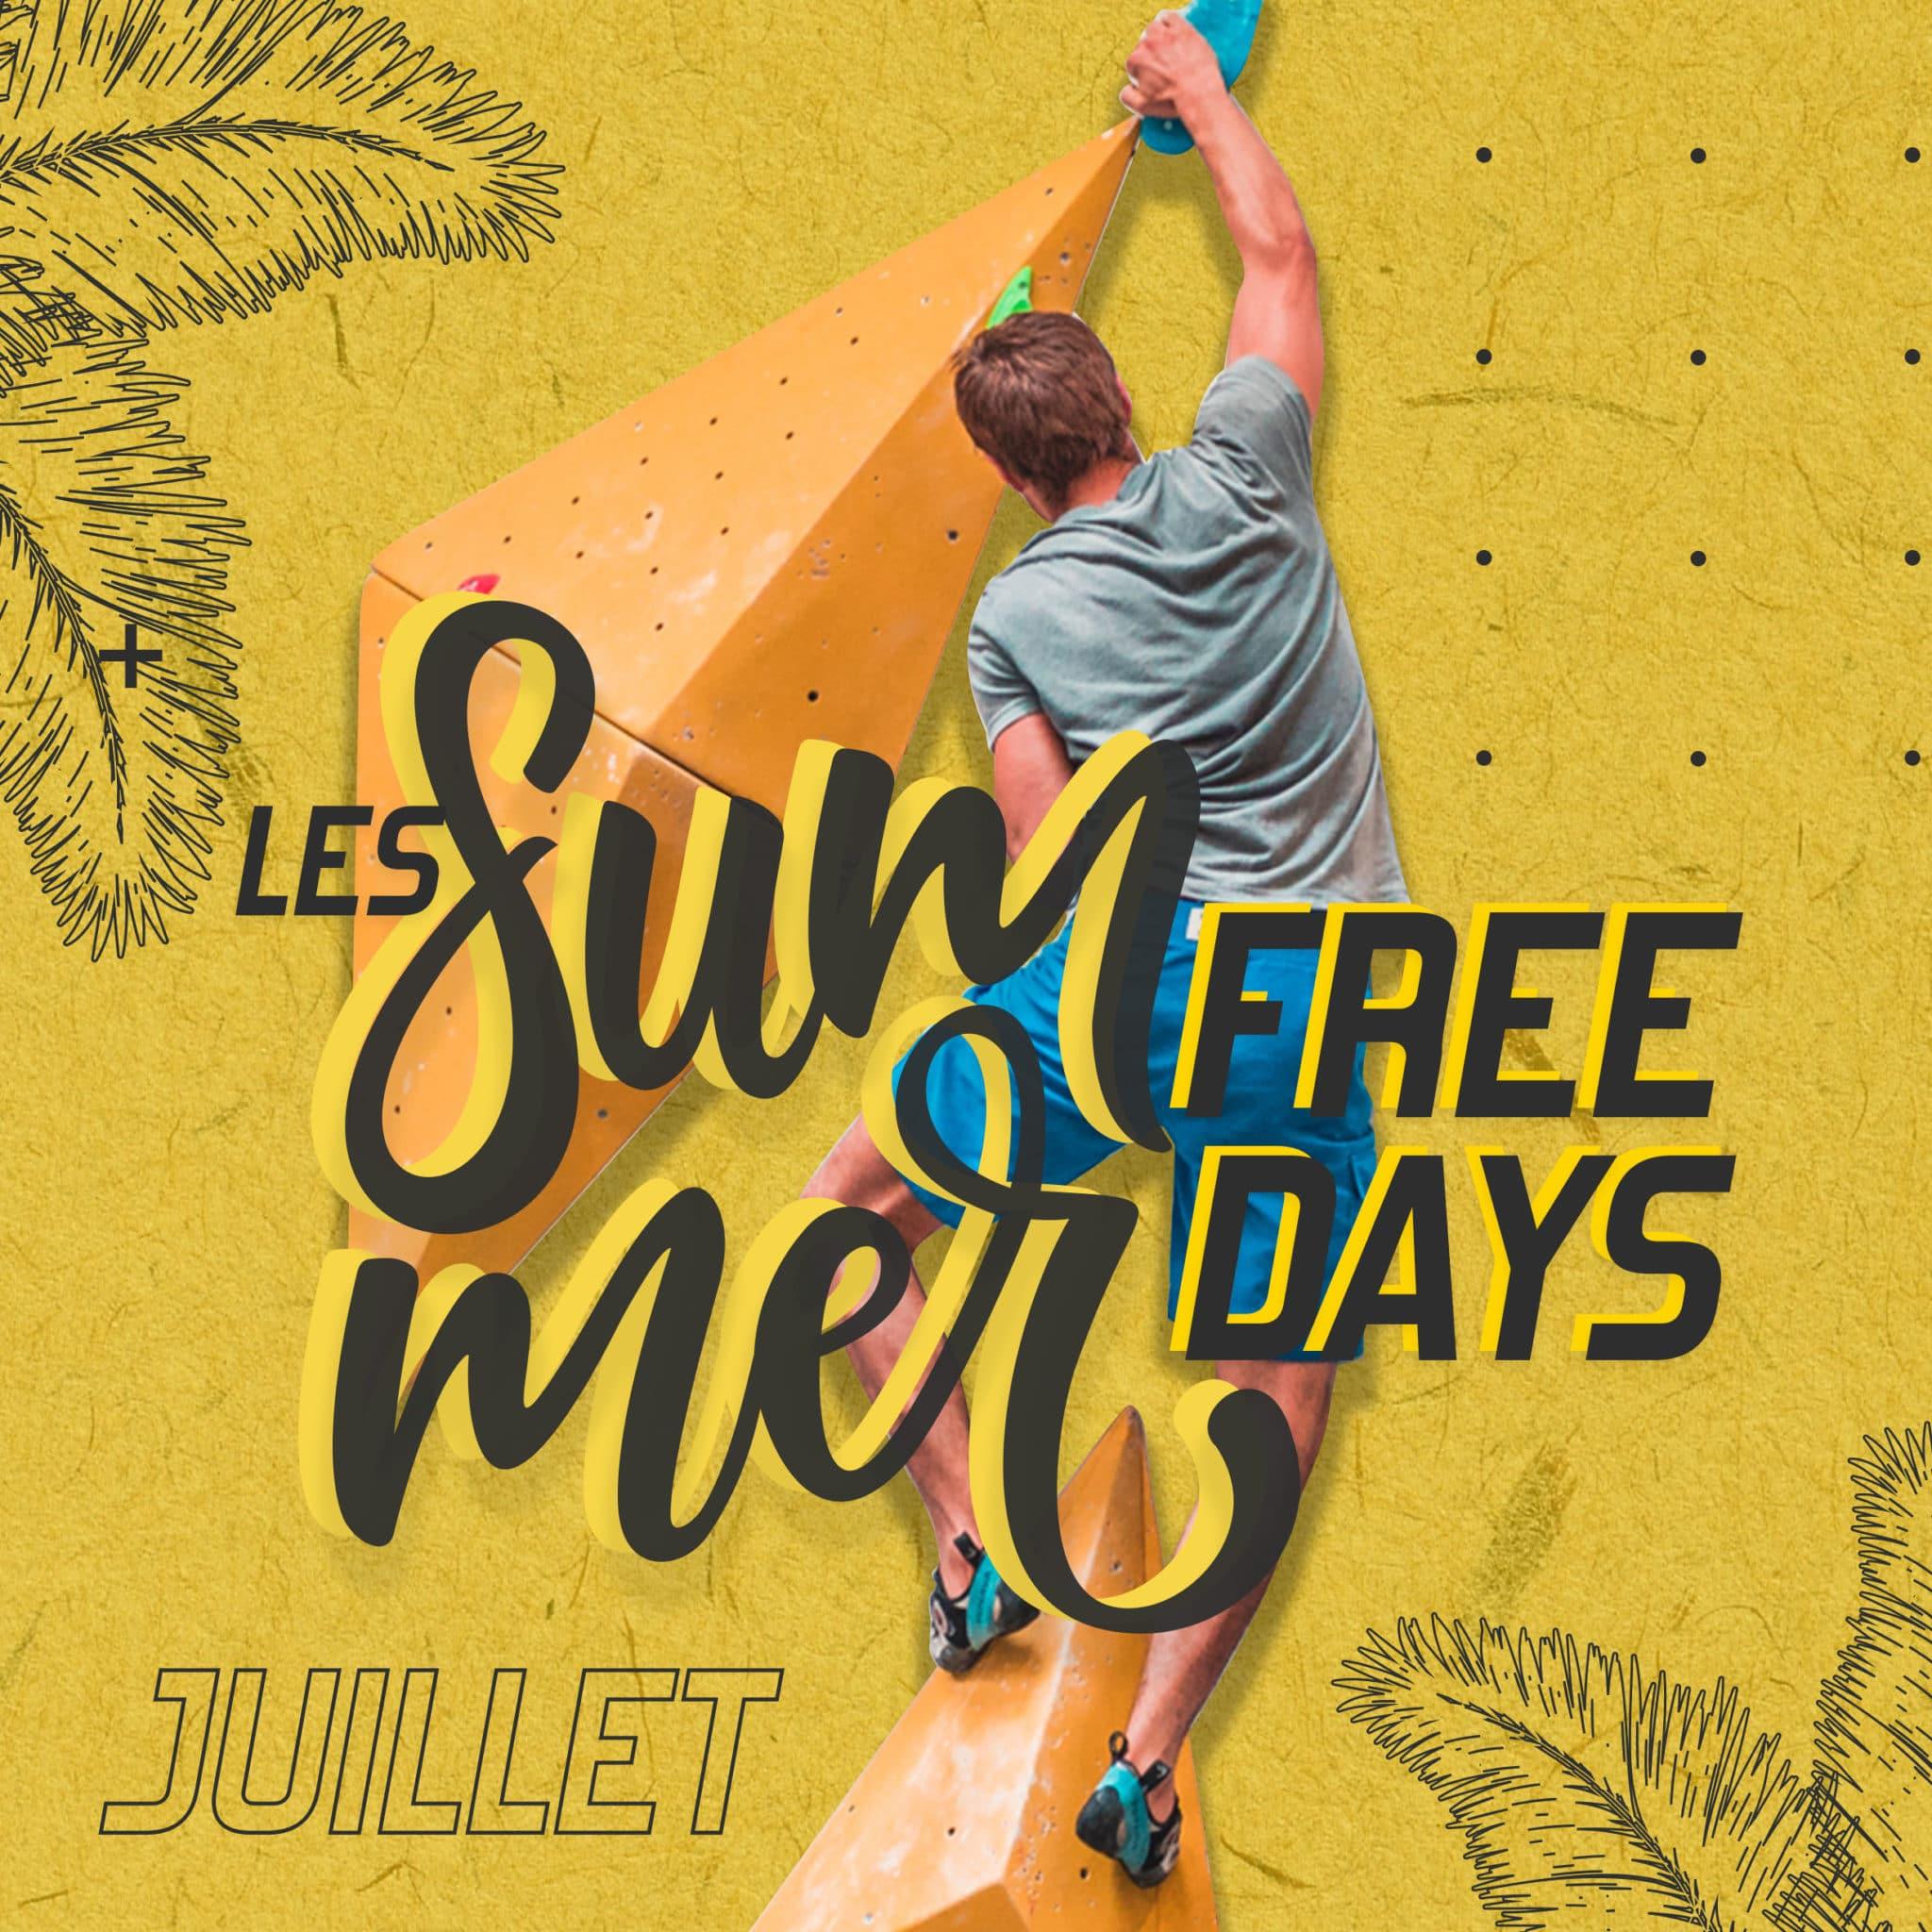 journée gratuite chez vertical art - juillet - free climbing - salle d'escalade - restaurant et bar